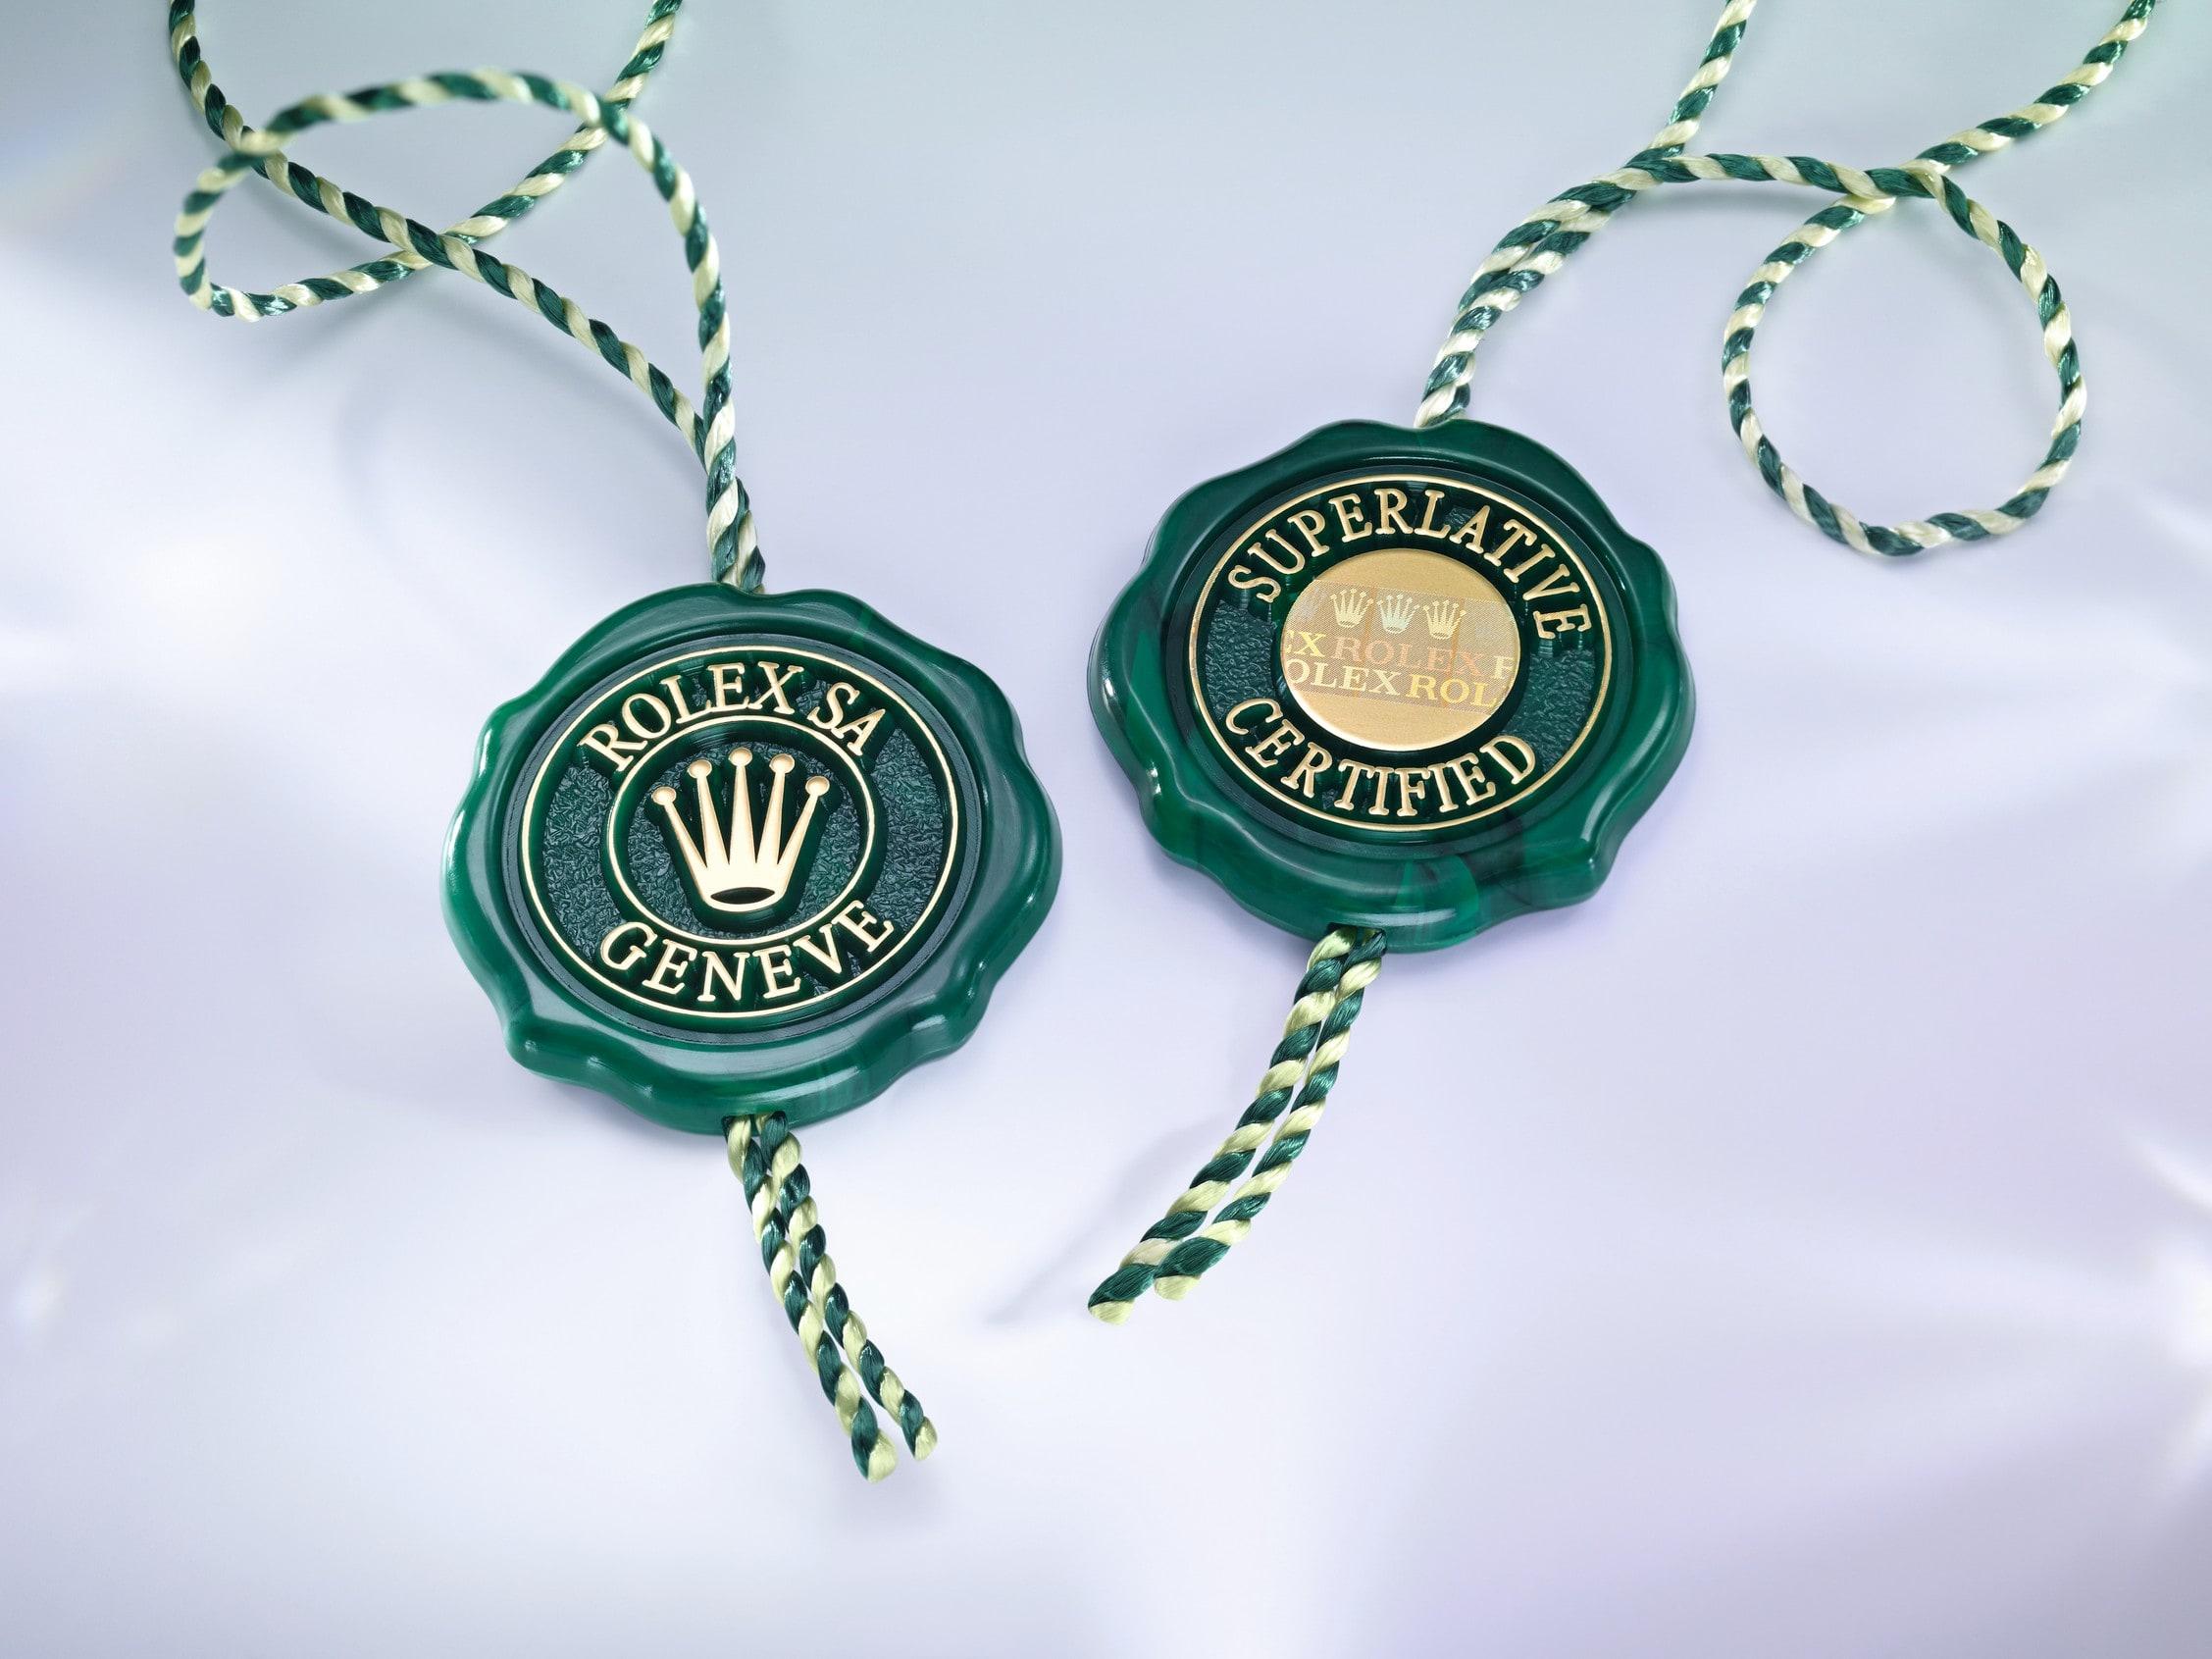 Rolex certified label